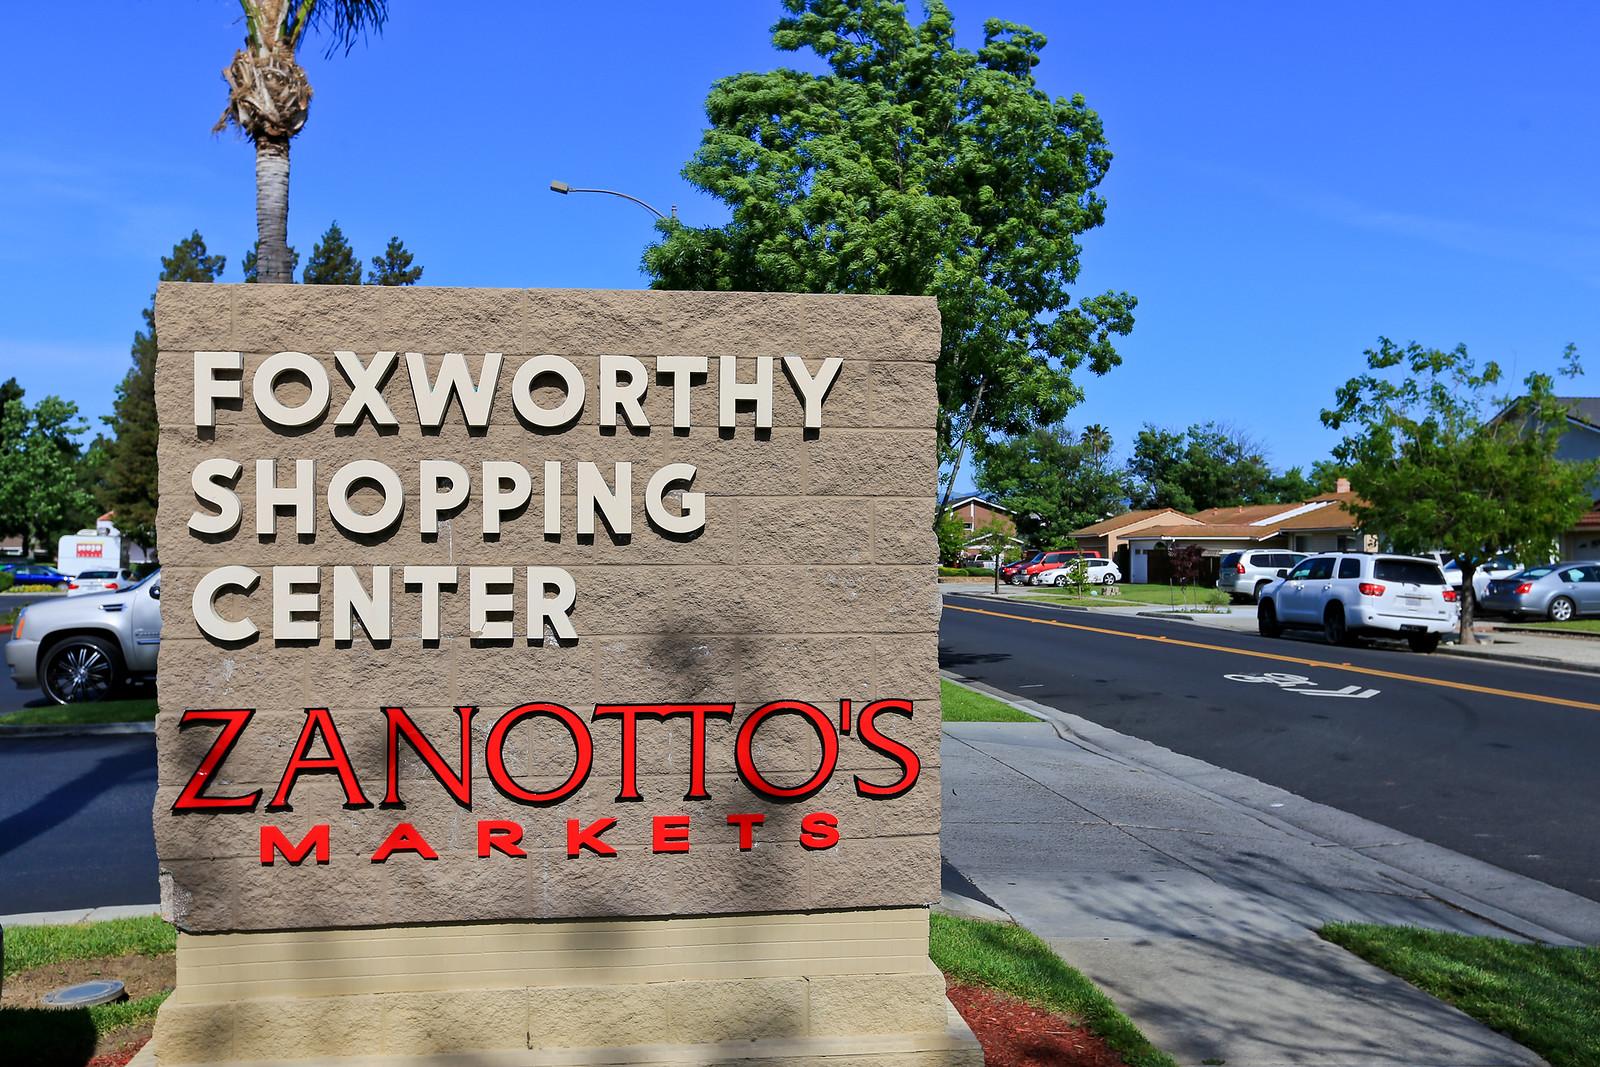 Foxworthy+Shopping+Center+Willow+Glen+Blu+Skye+Media-X3.jpg